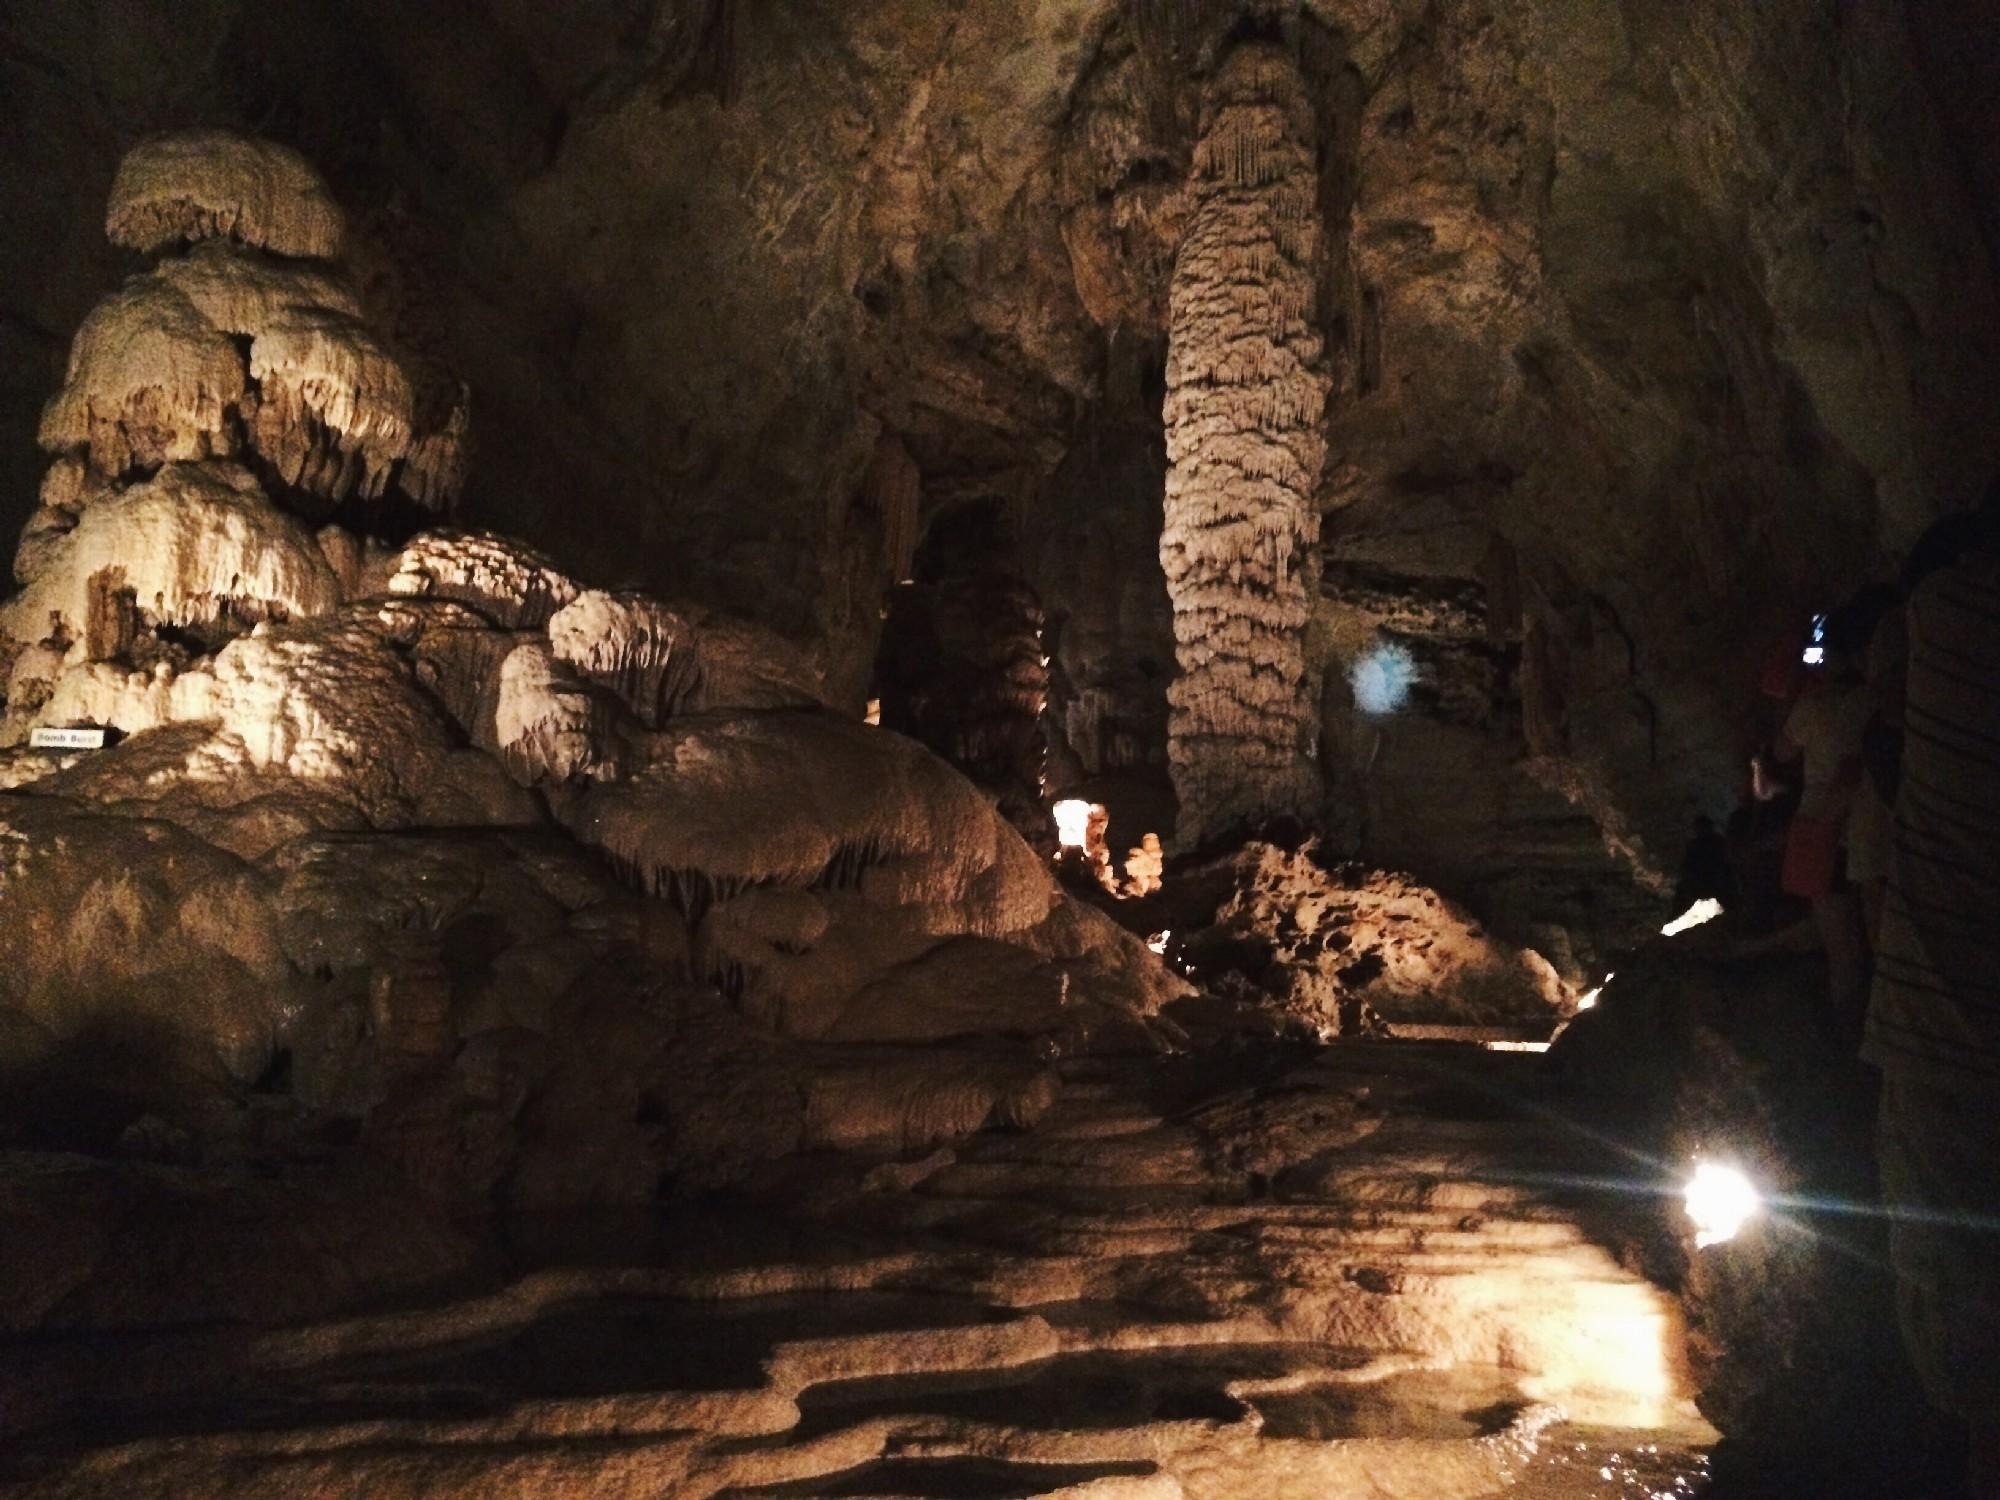 Natural Bridge Caverns - Elilai Davis